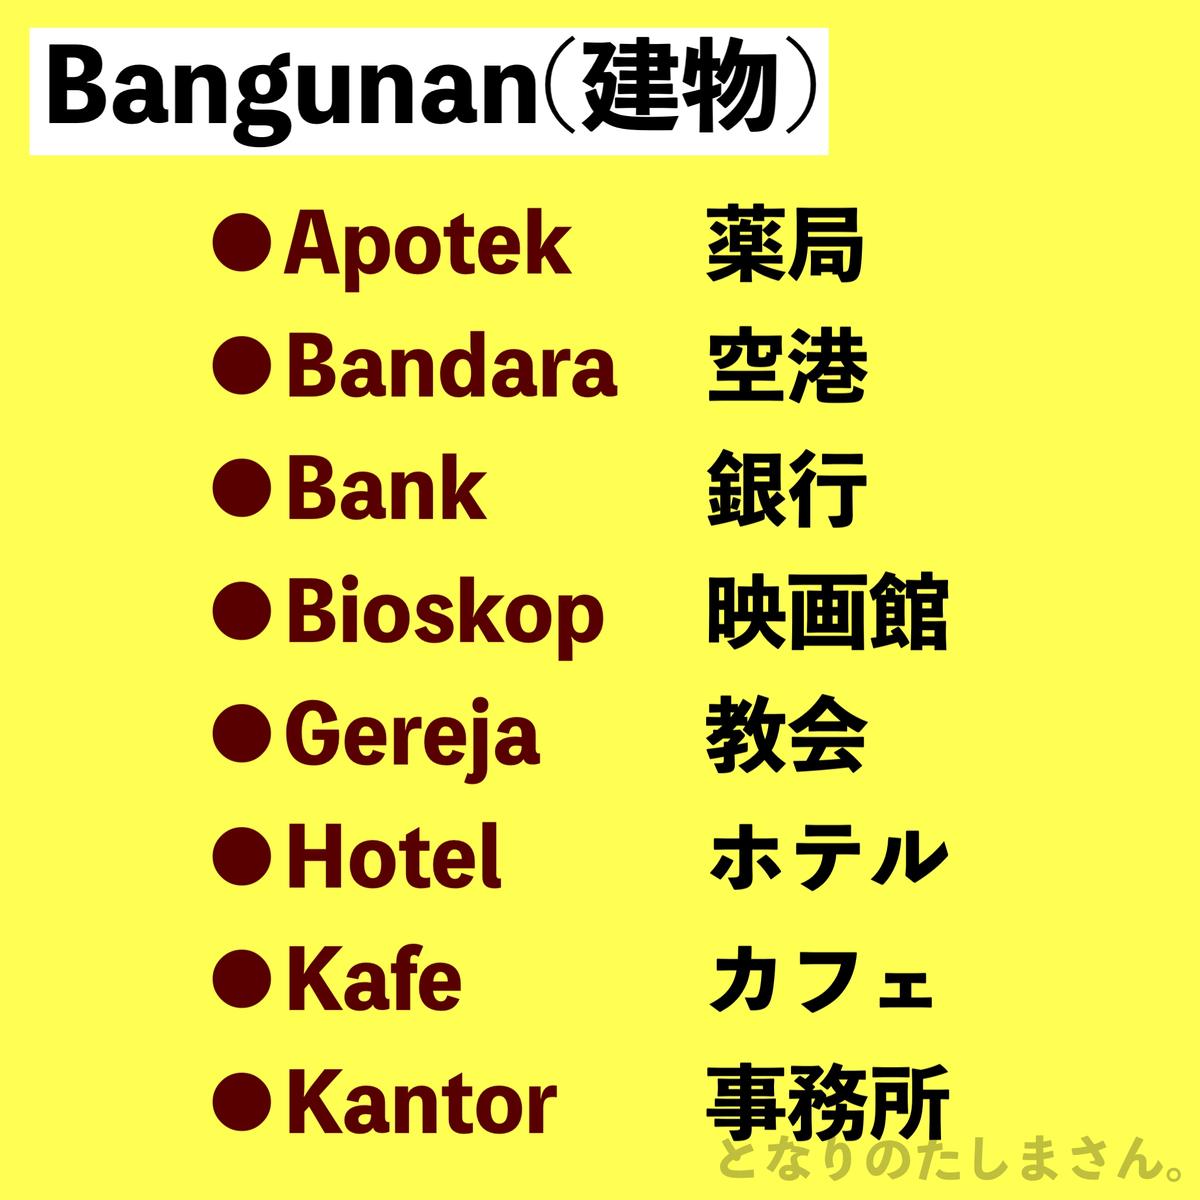 f:id:yutonsmaile:20210928153745j:plain